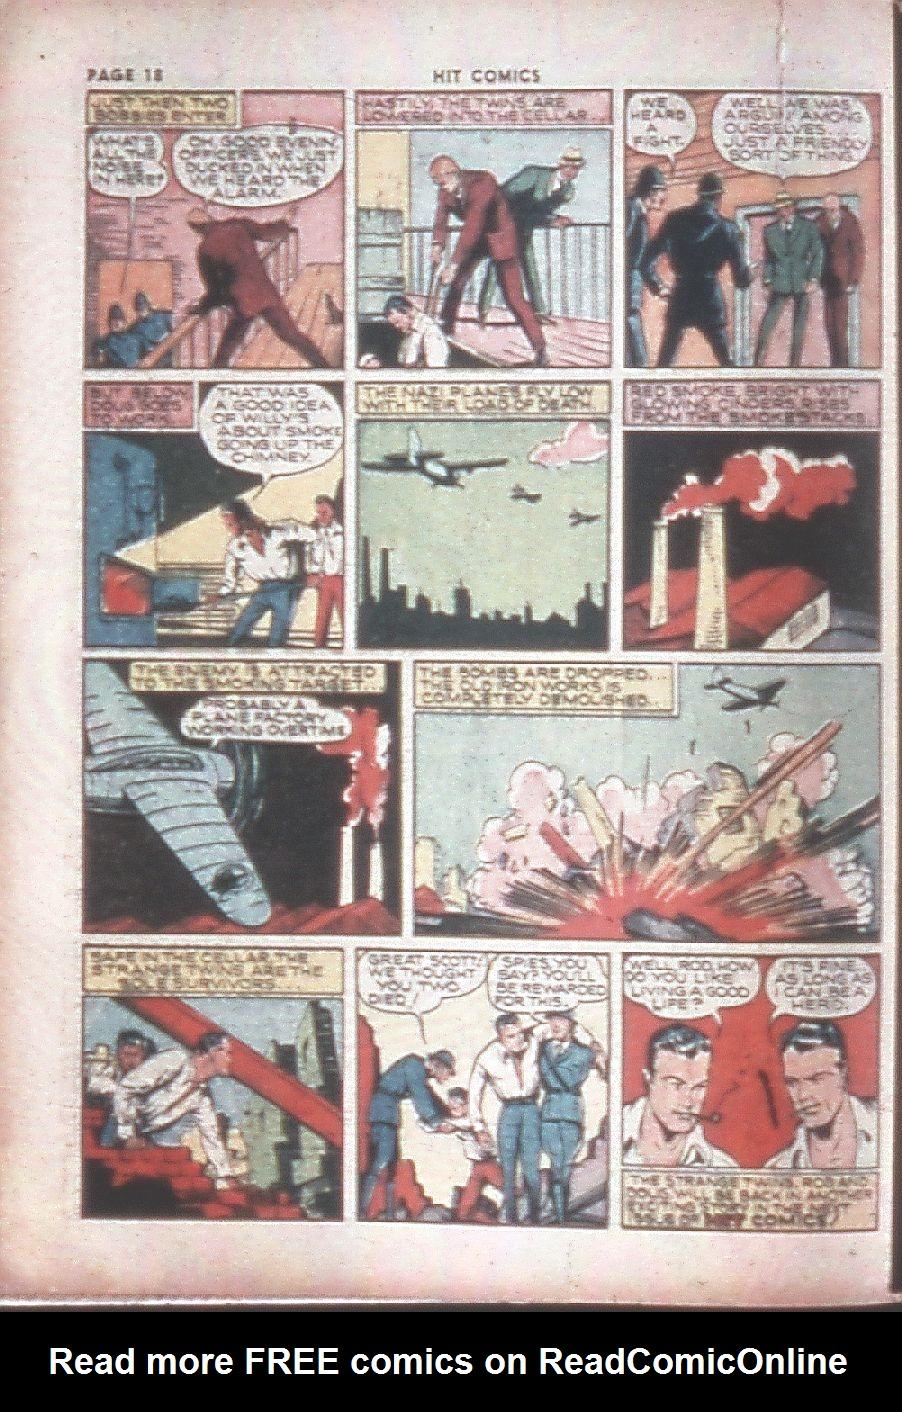 Read online Hit Comics comic -  Issue #8 - 20